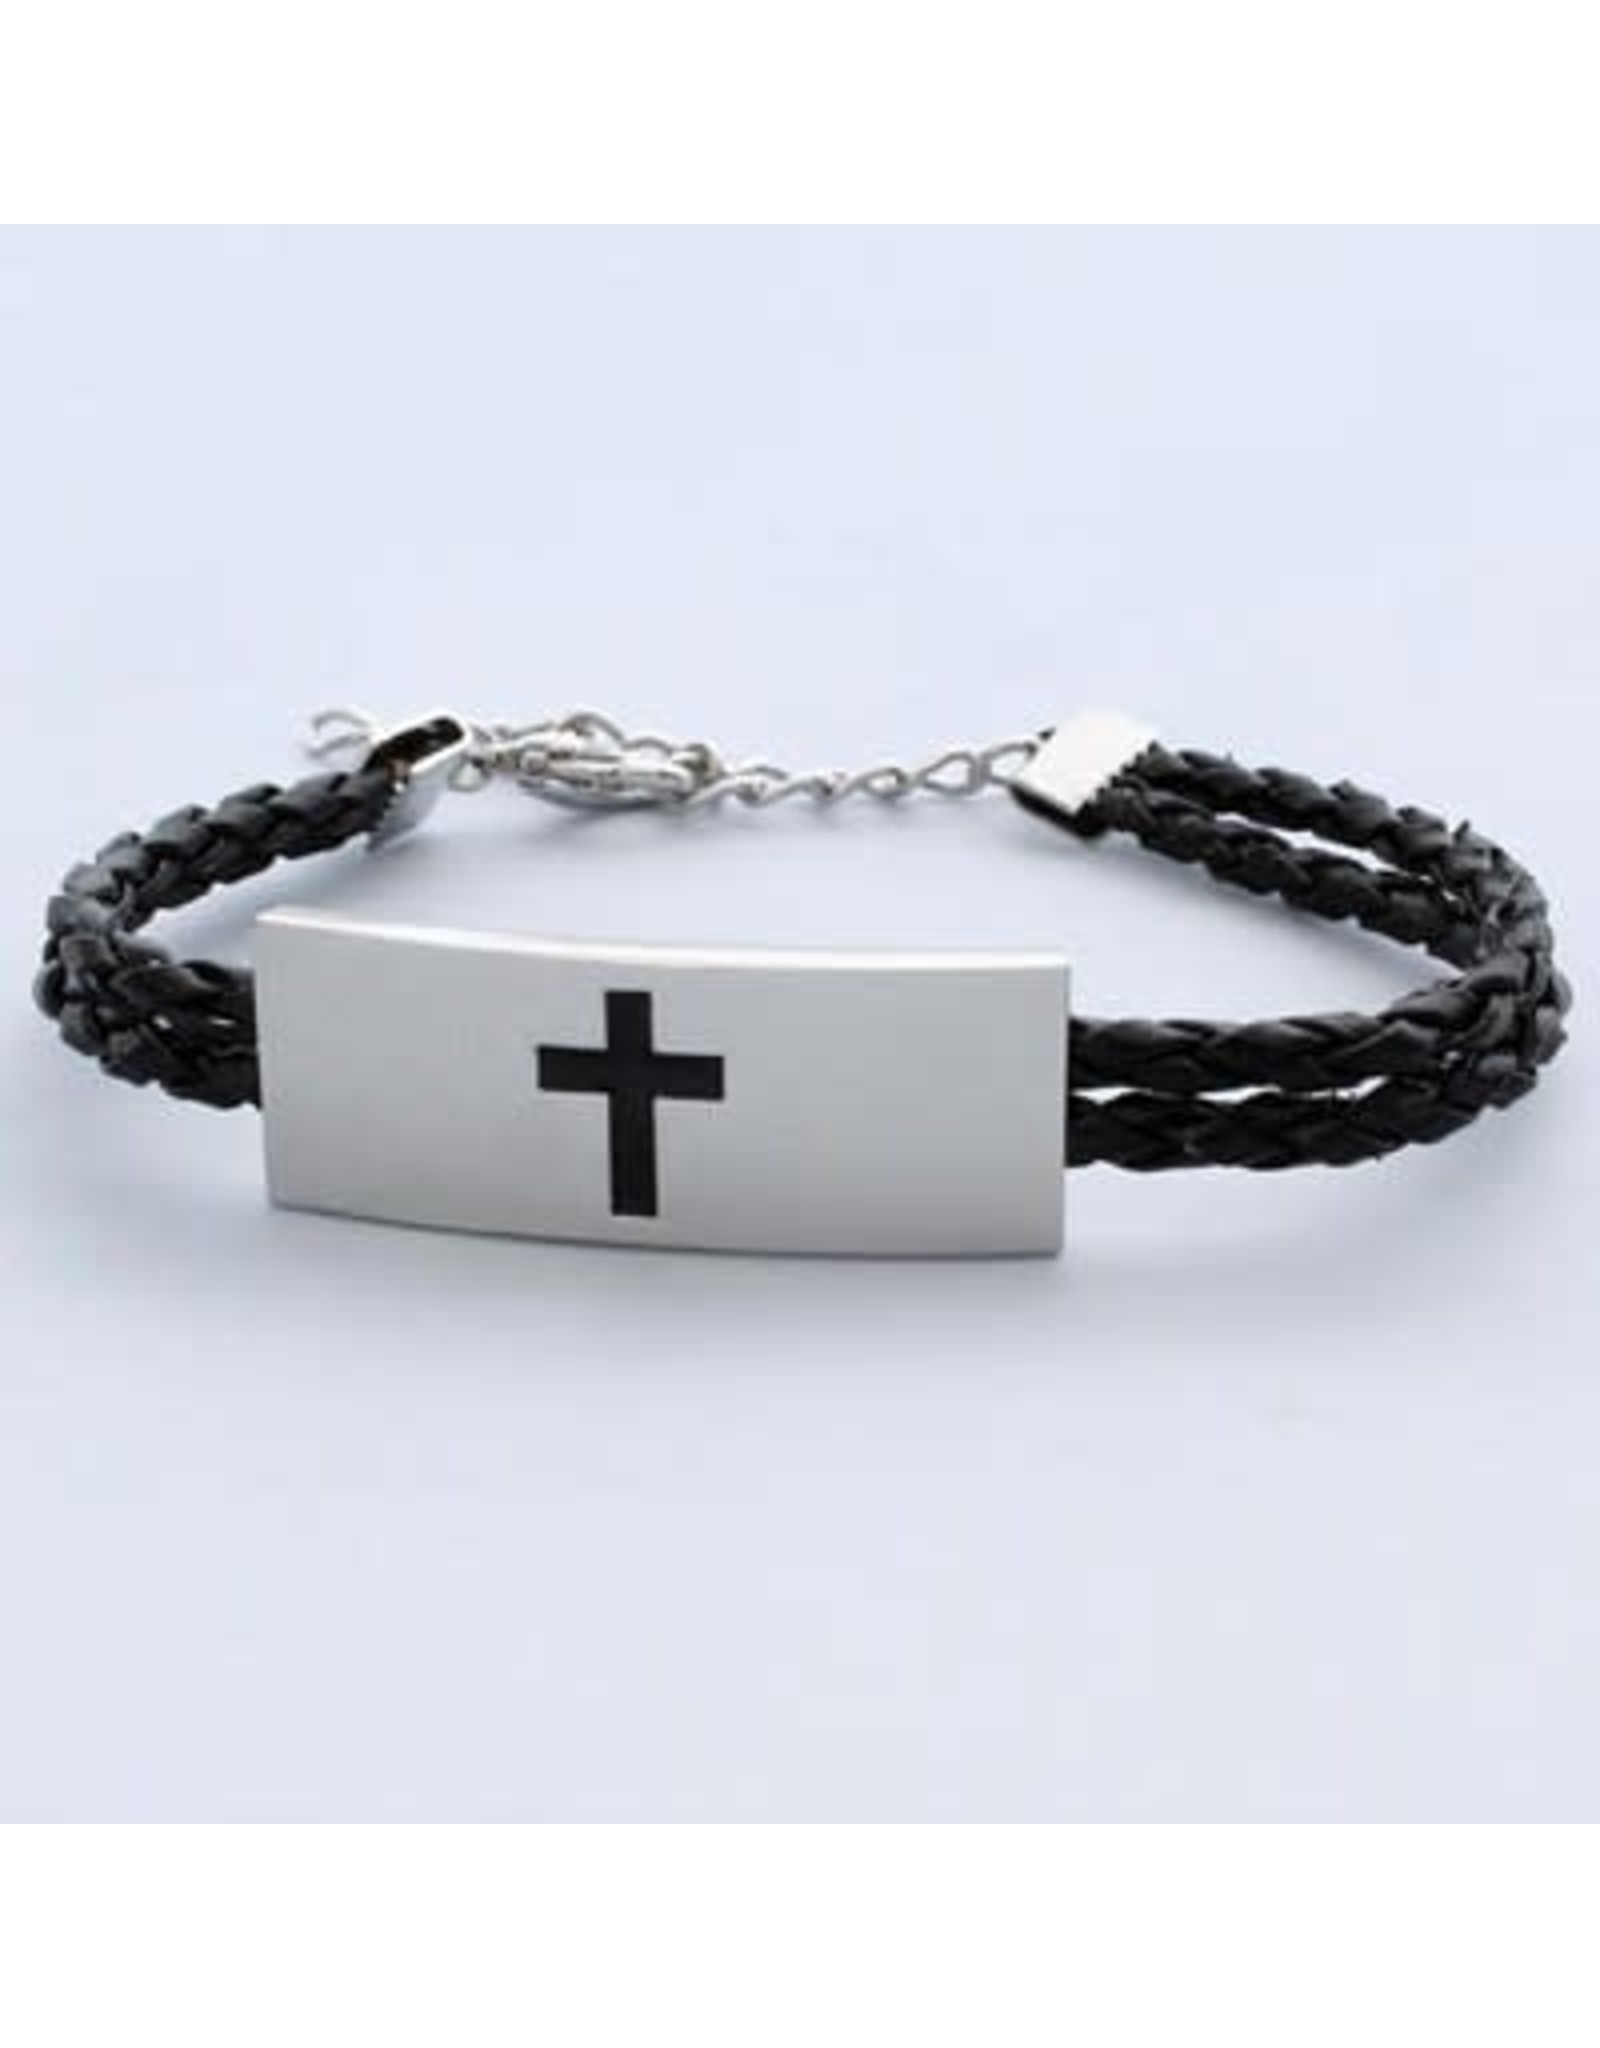 Bracelet Cross Leather/Stainless Steel